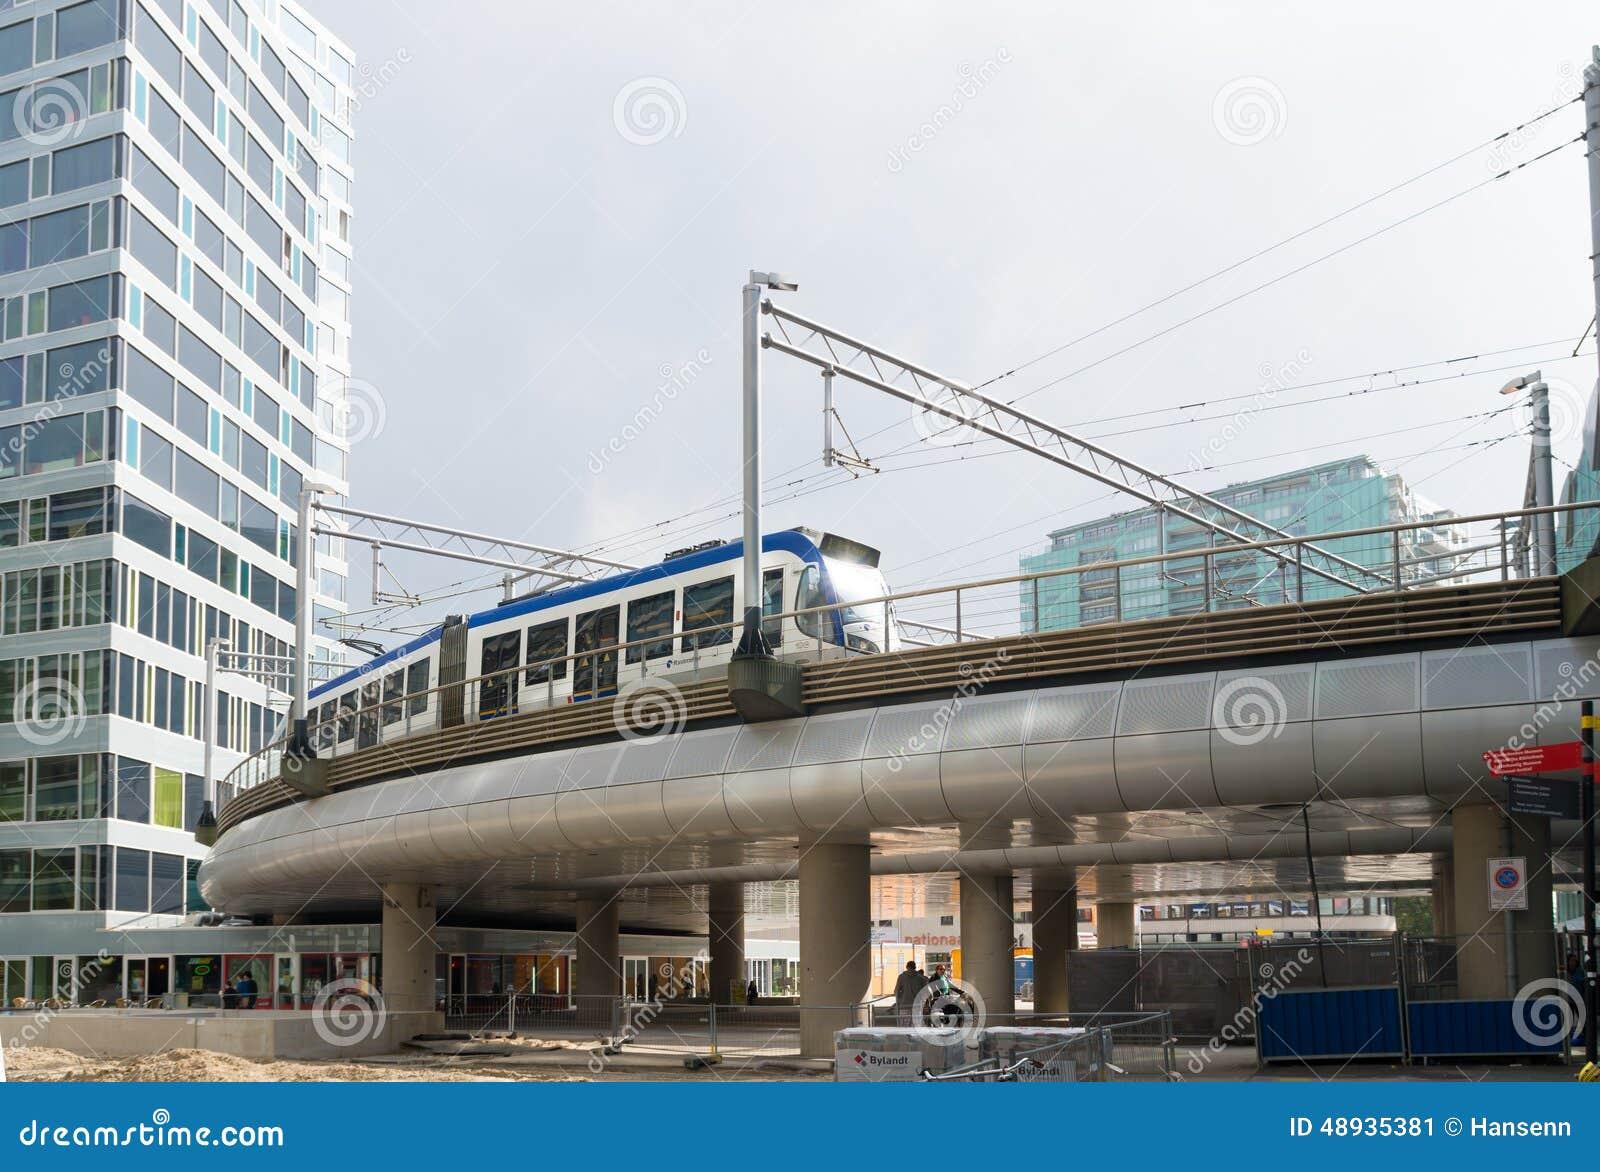 elevated-railway-tram-hague-netherlands-48935381.jpg